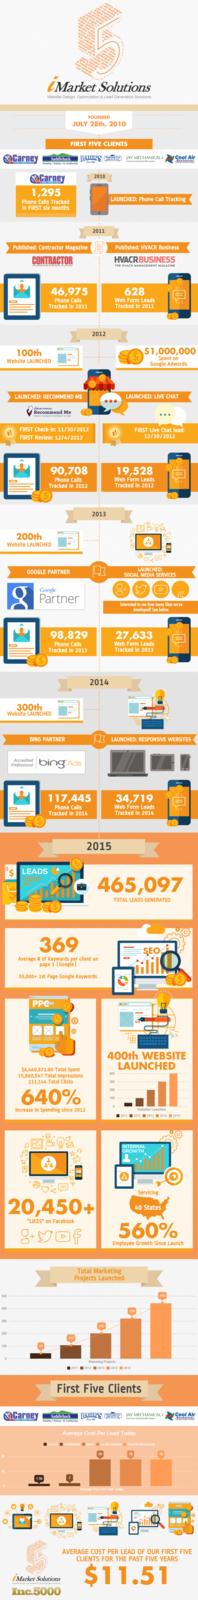 iMarket Solutions Five Year Anniversary (1)